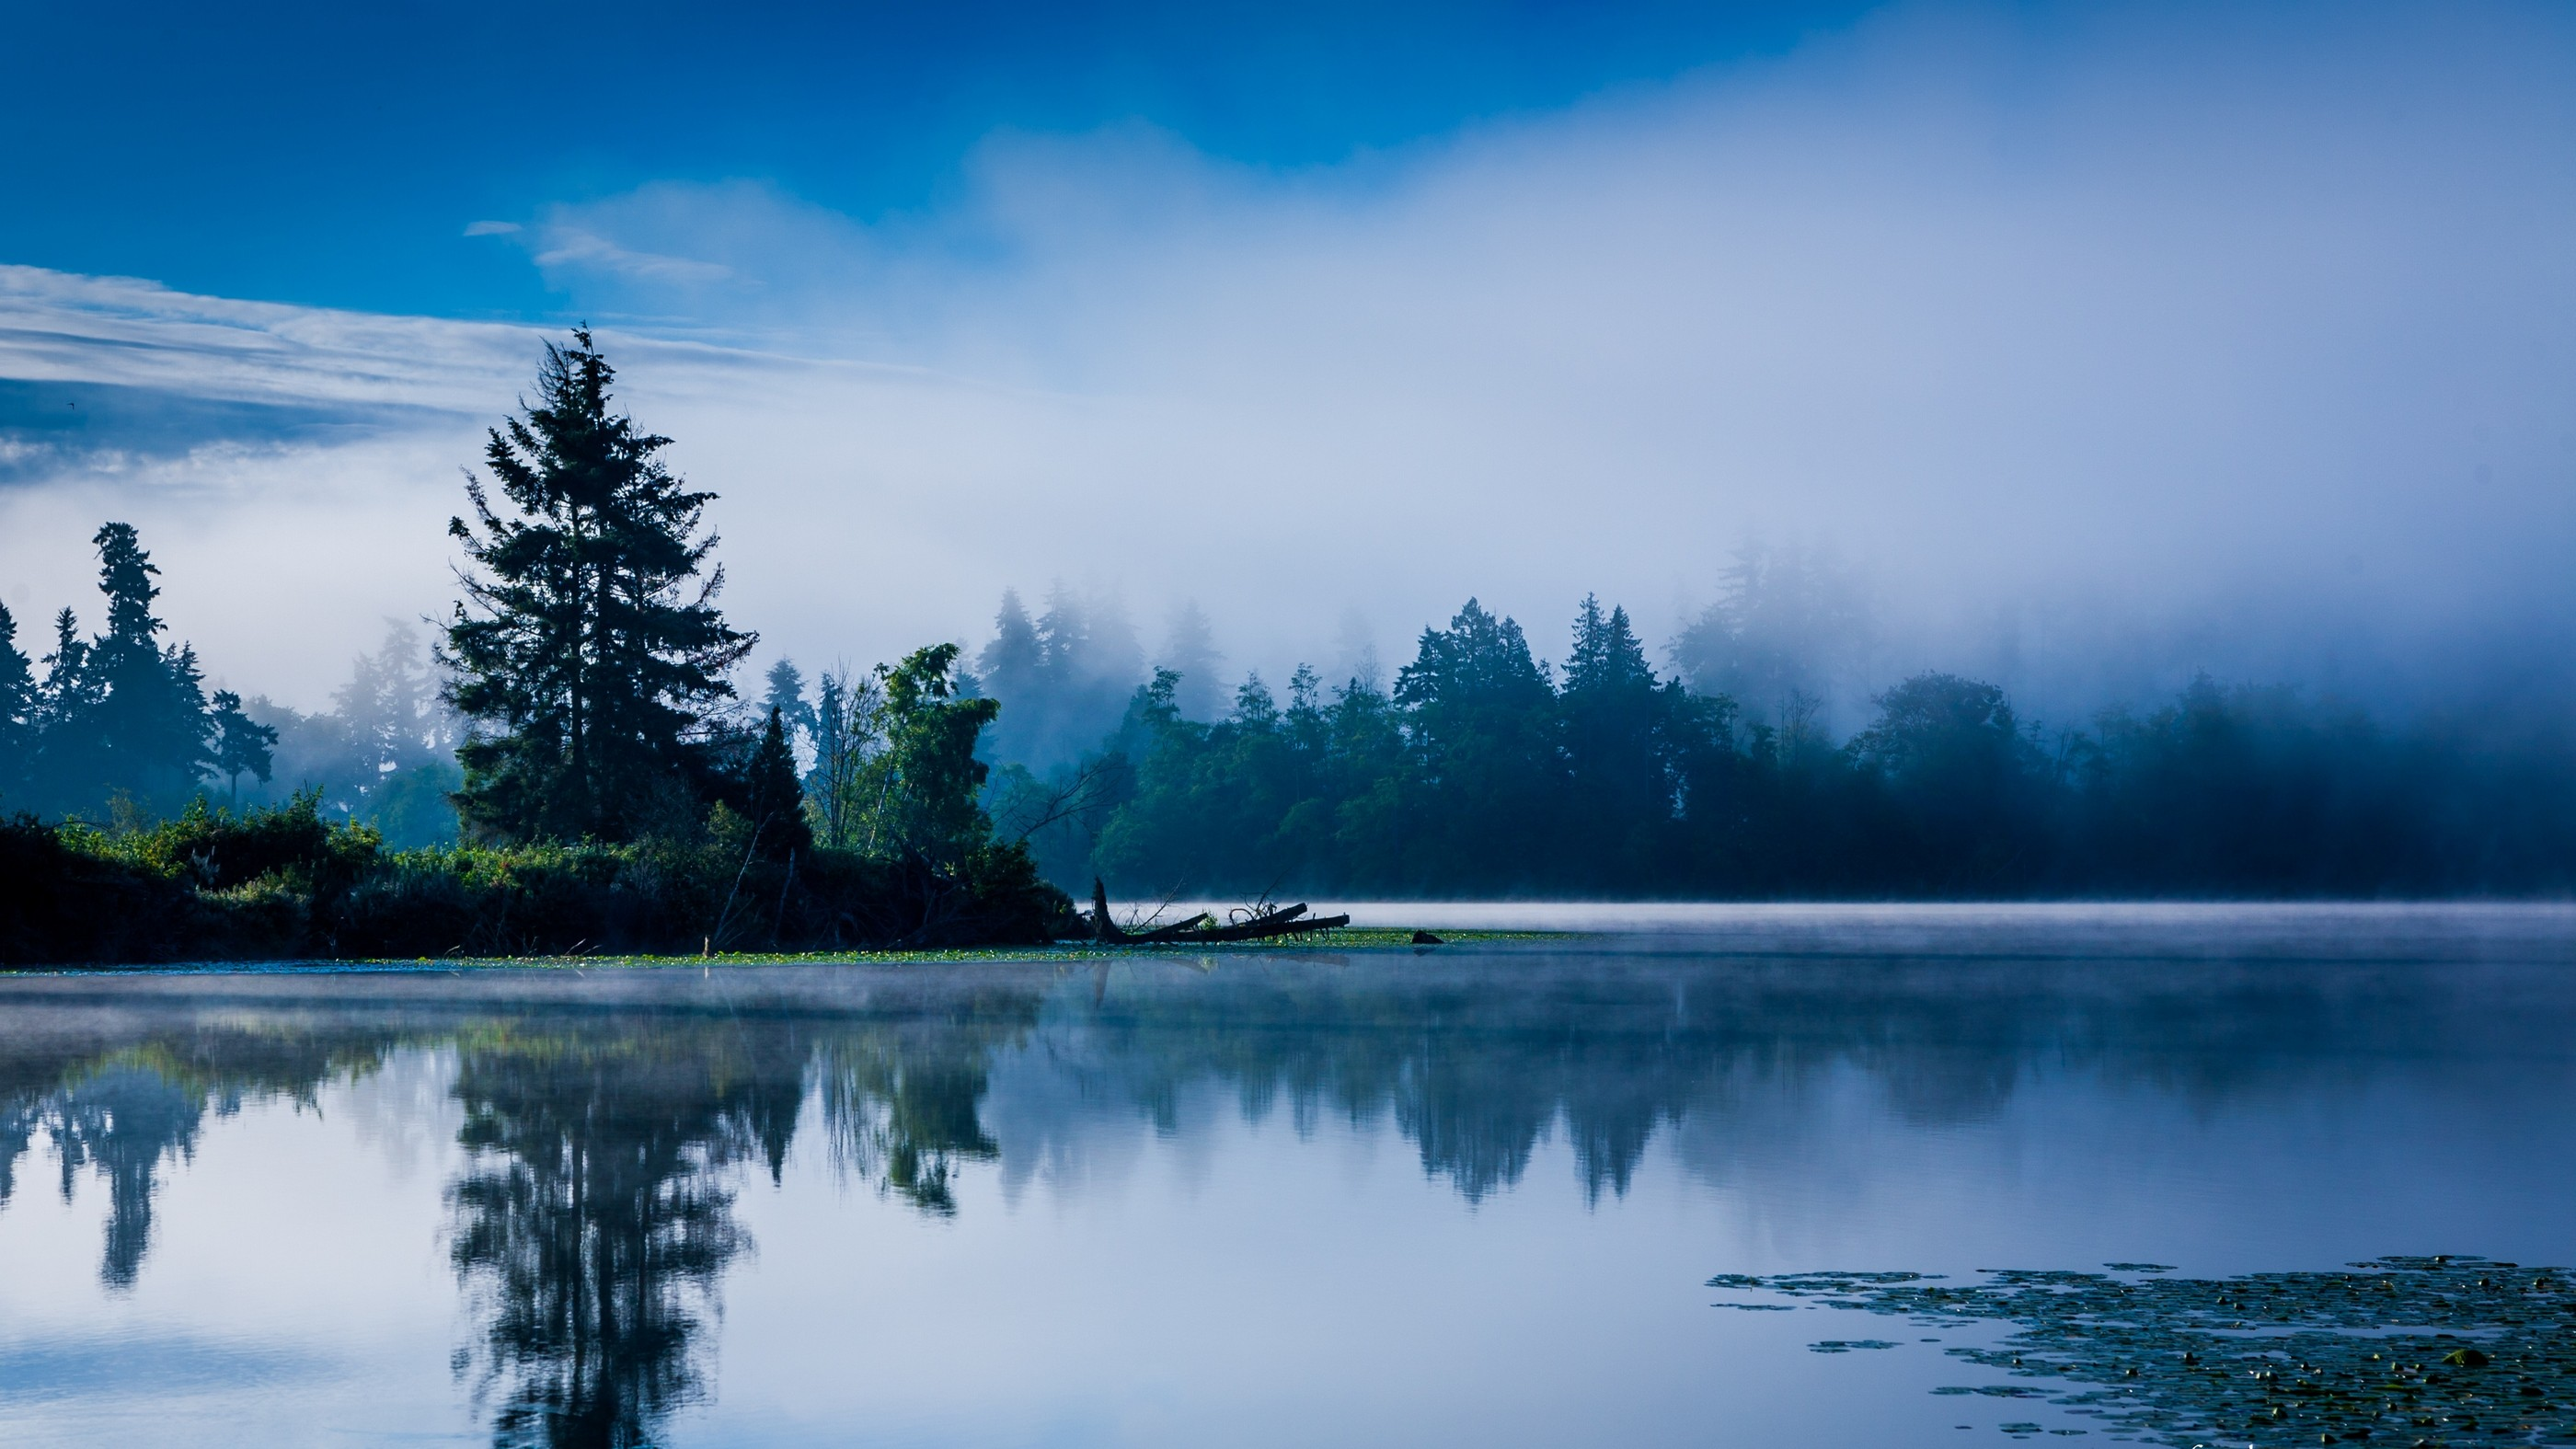 Microsoft Fall Wallpaper Lake Mist Nature Landscape Blue Calm Morning Trees